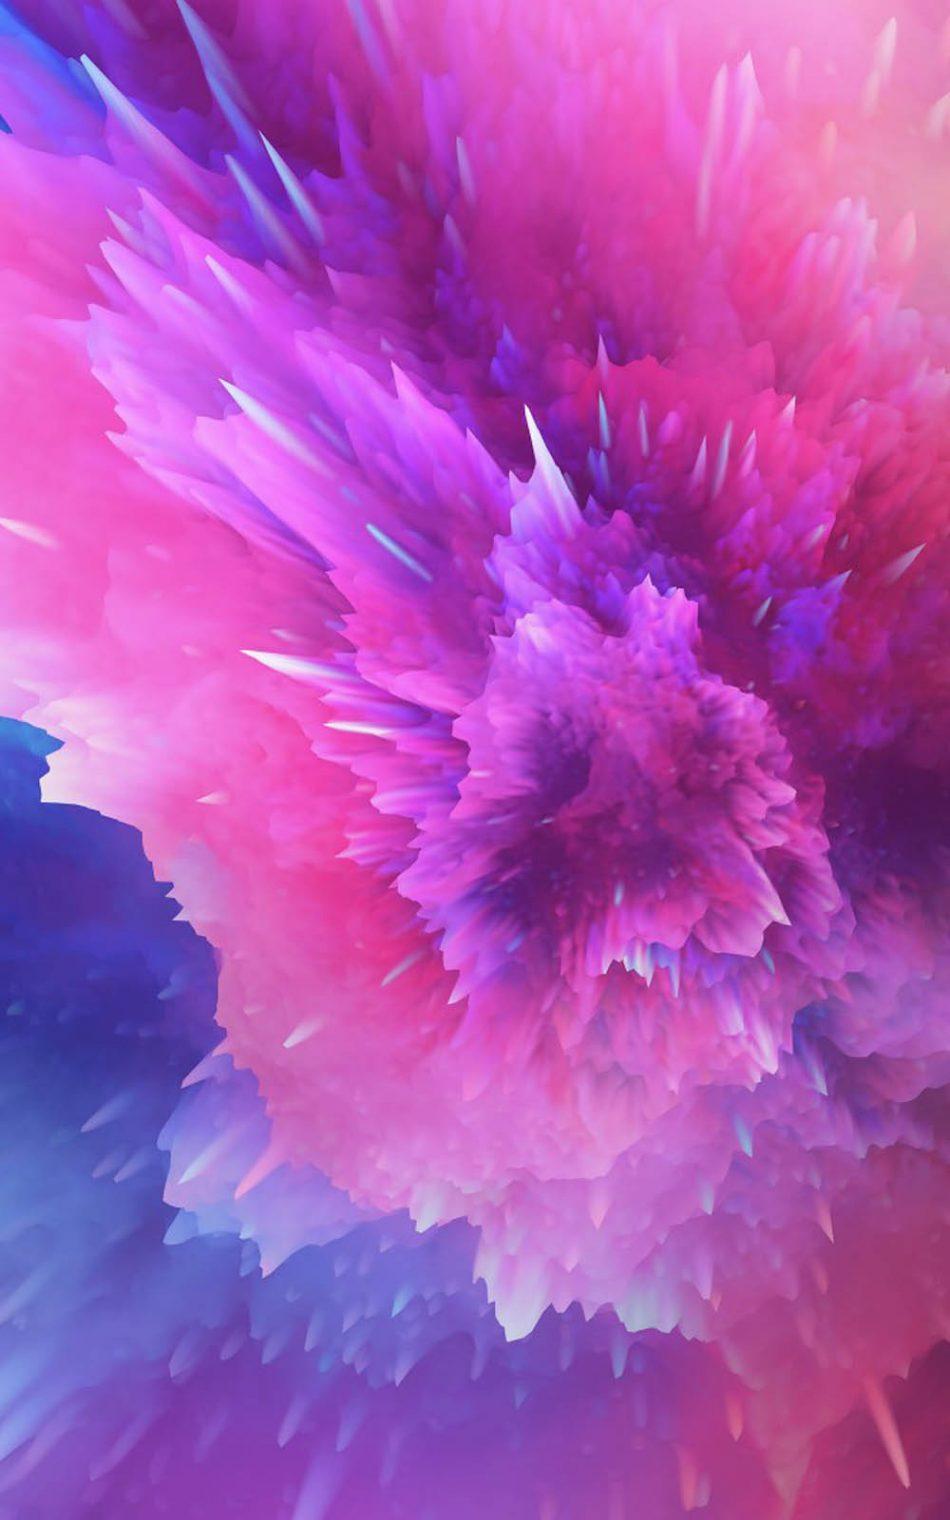 Color Splash Art HD Mobile Wallpaper